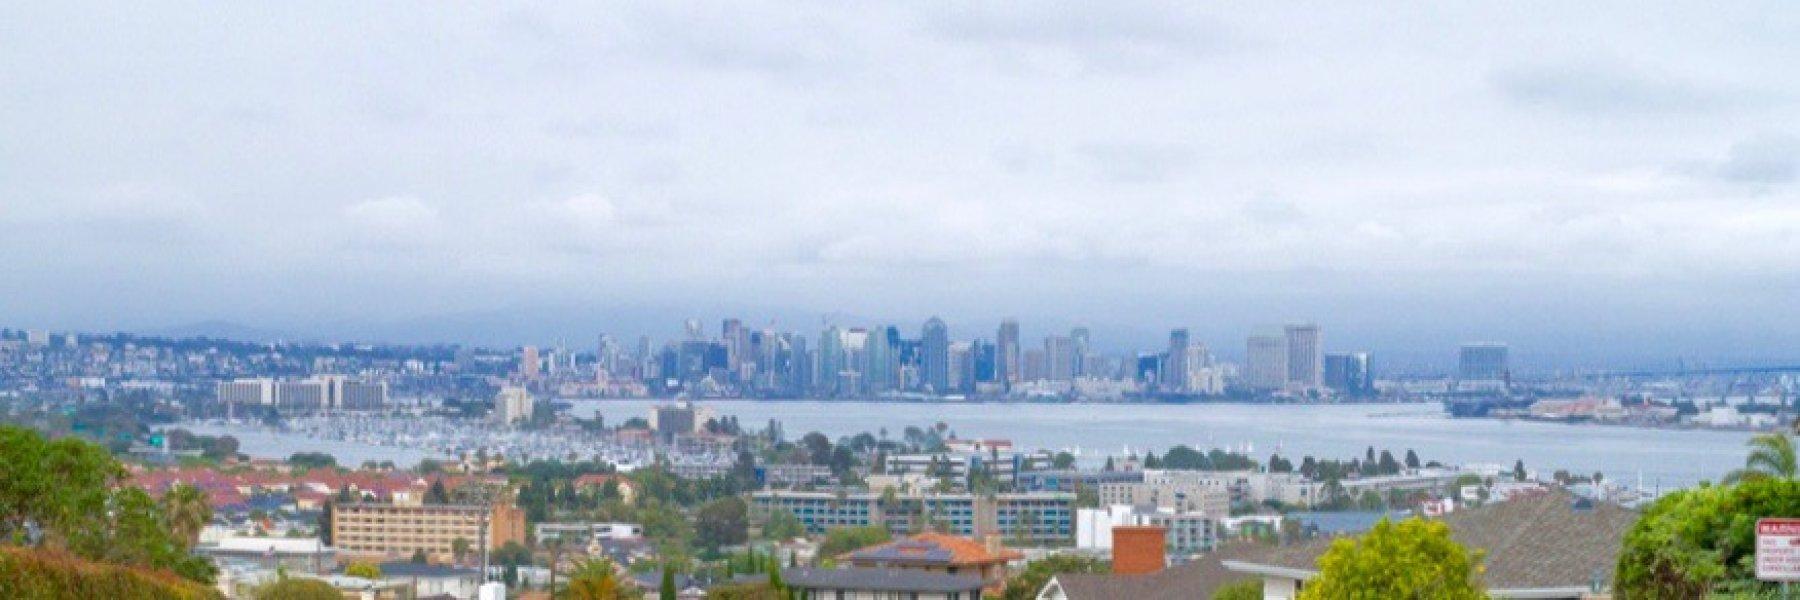 Fleetridge is a community of homes in San Diego California